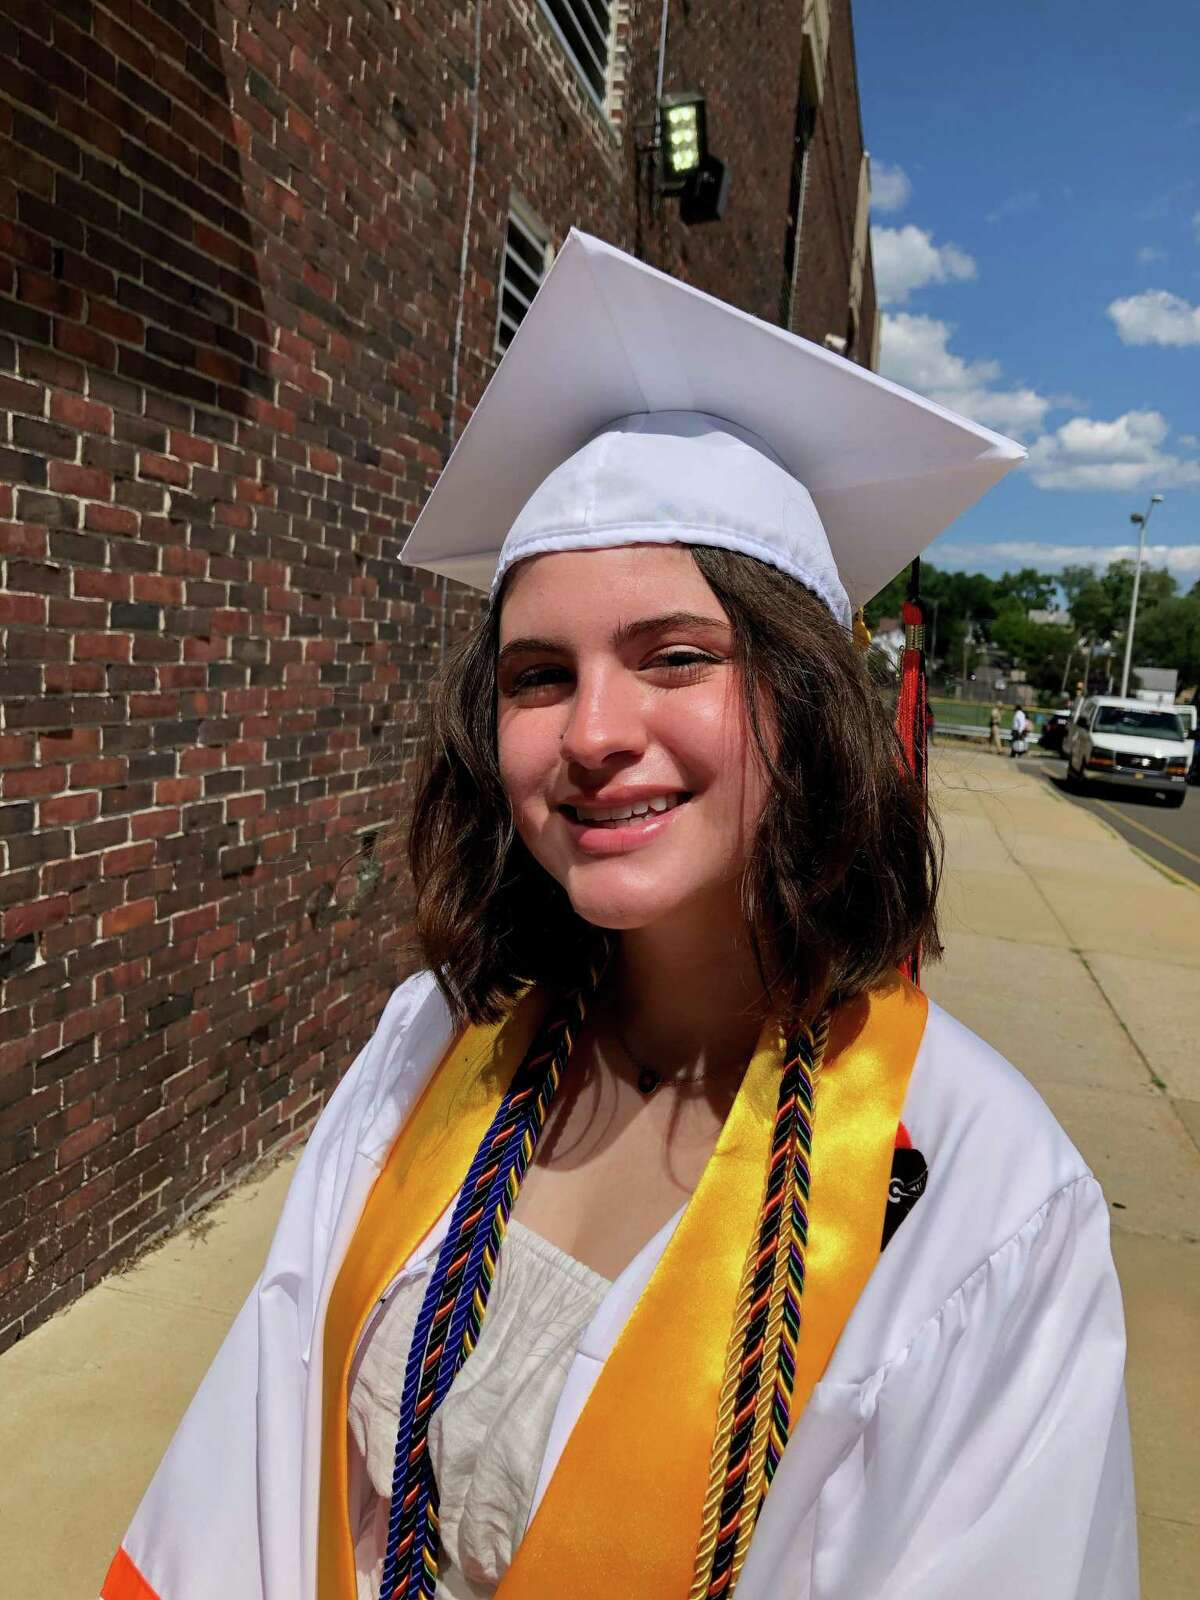 Stamford High School graduate Nina Giancola